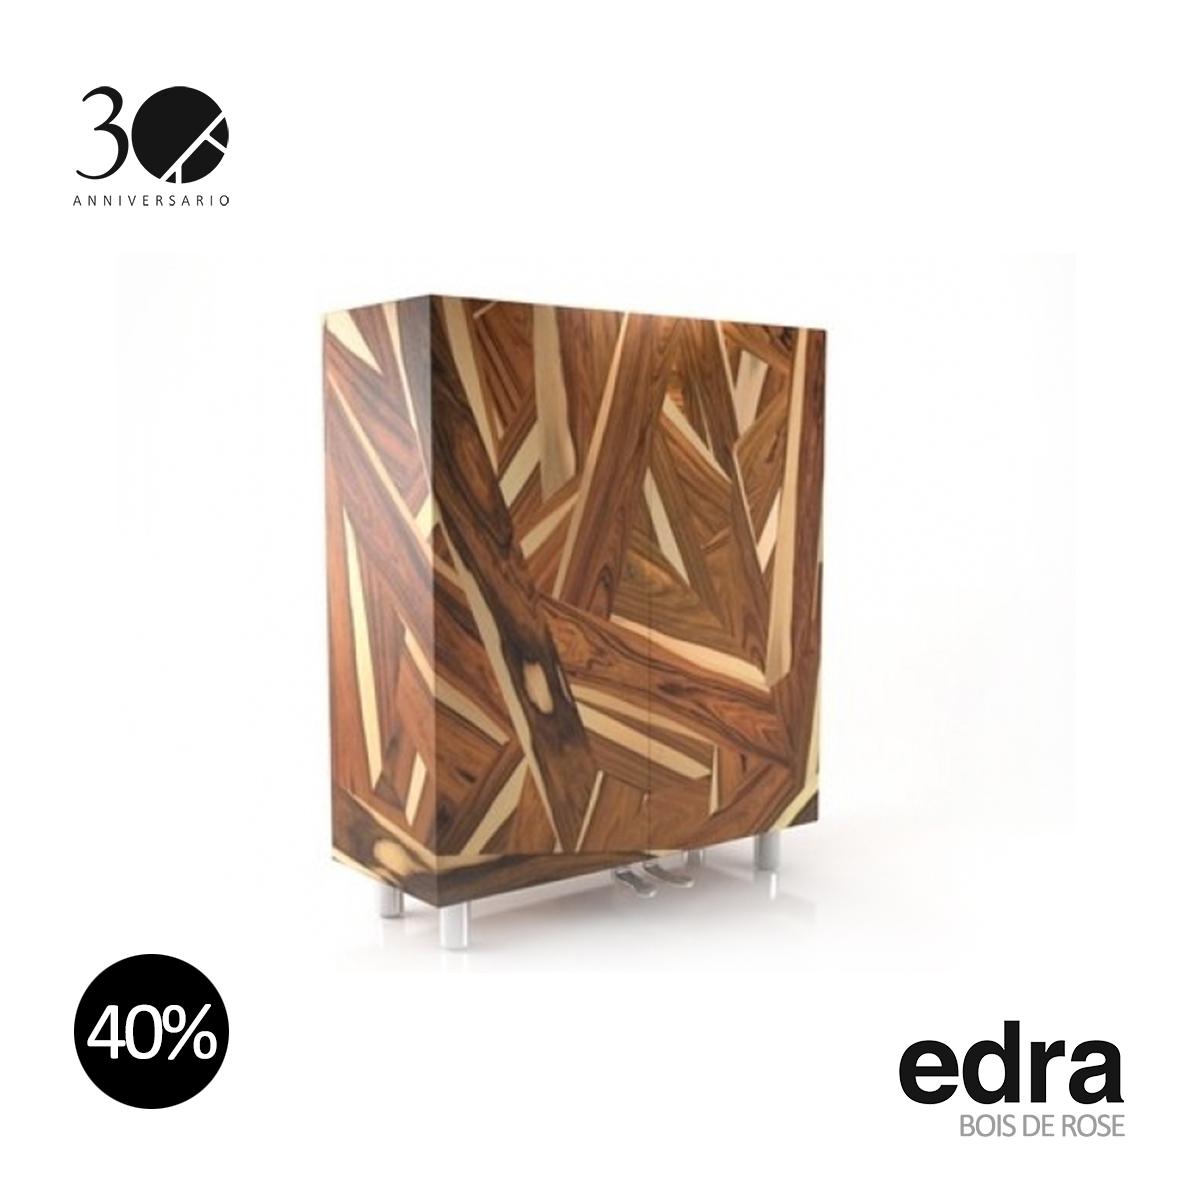 edra - bois de rose